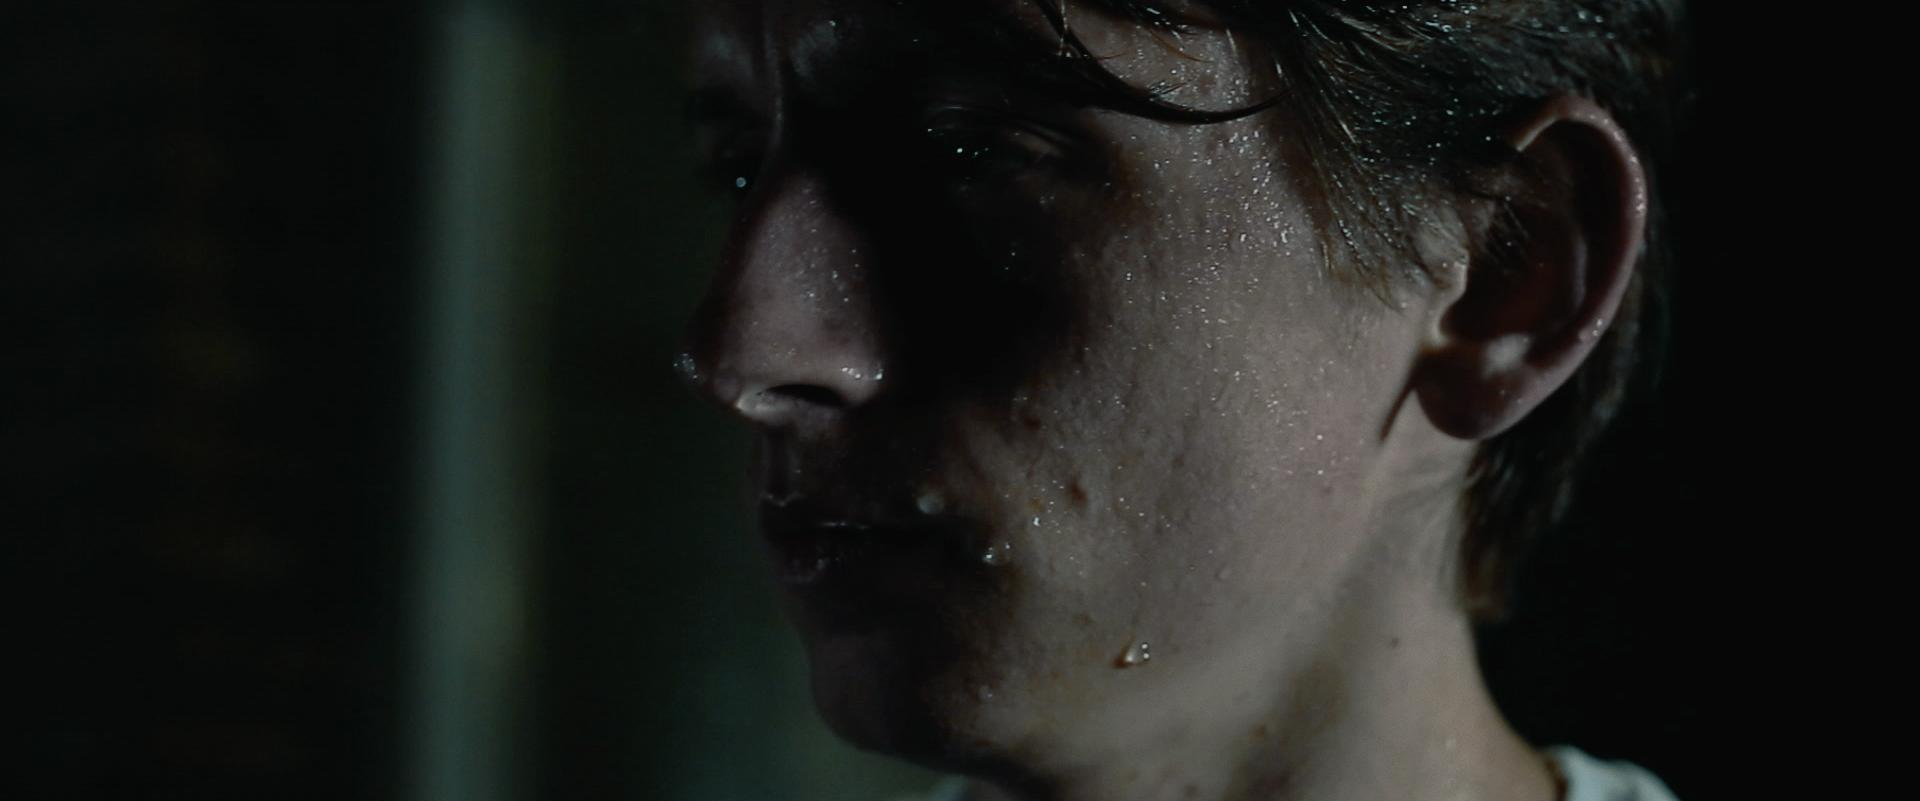 Still from the film Gesloten Deuren. It's a close-up of Jasper standing in the rain.